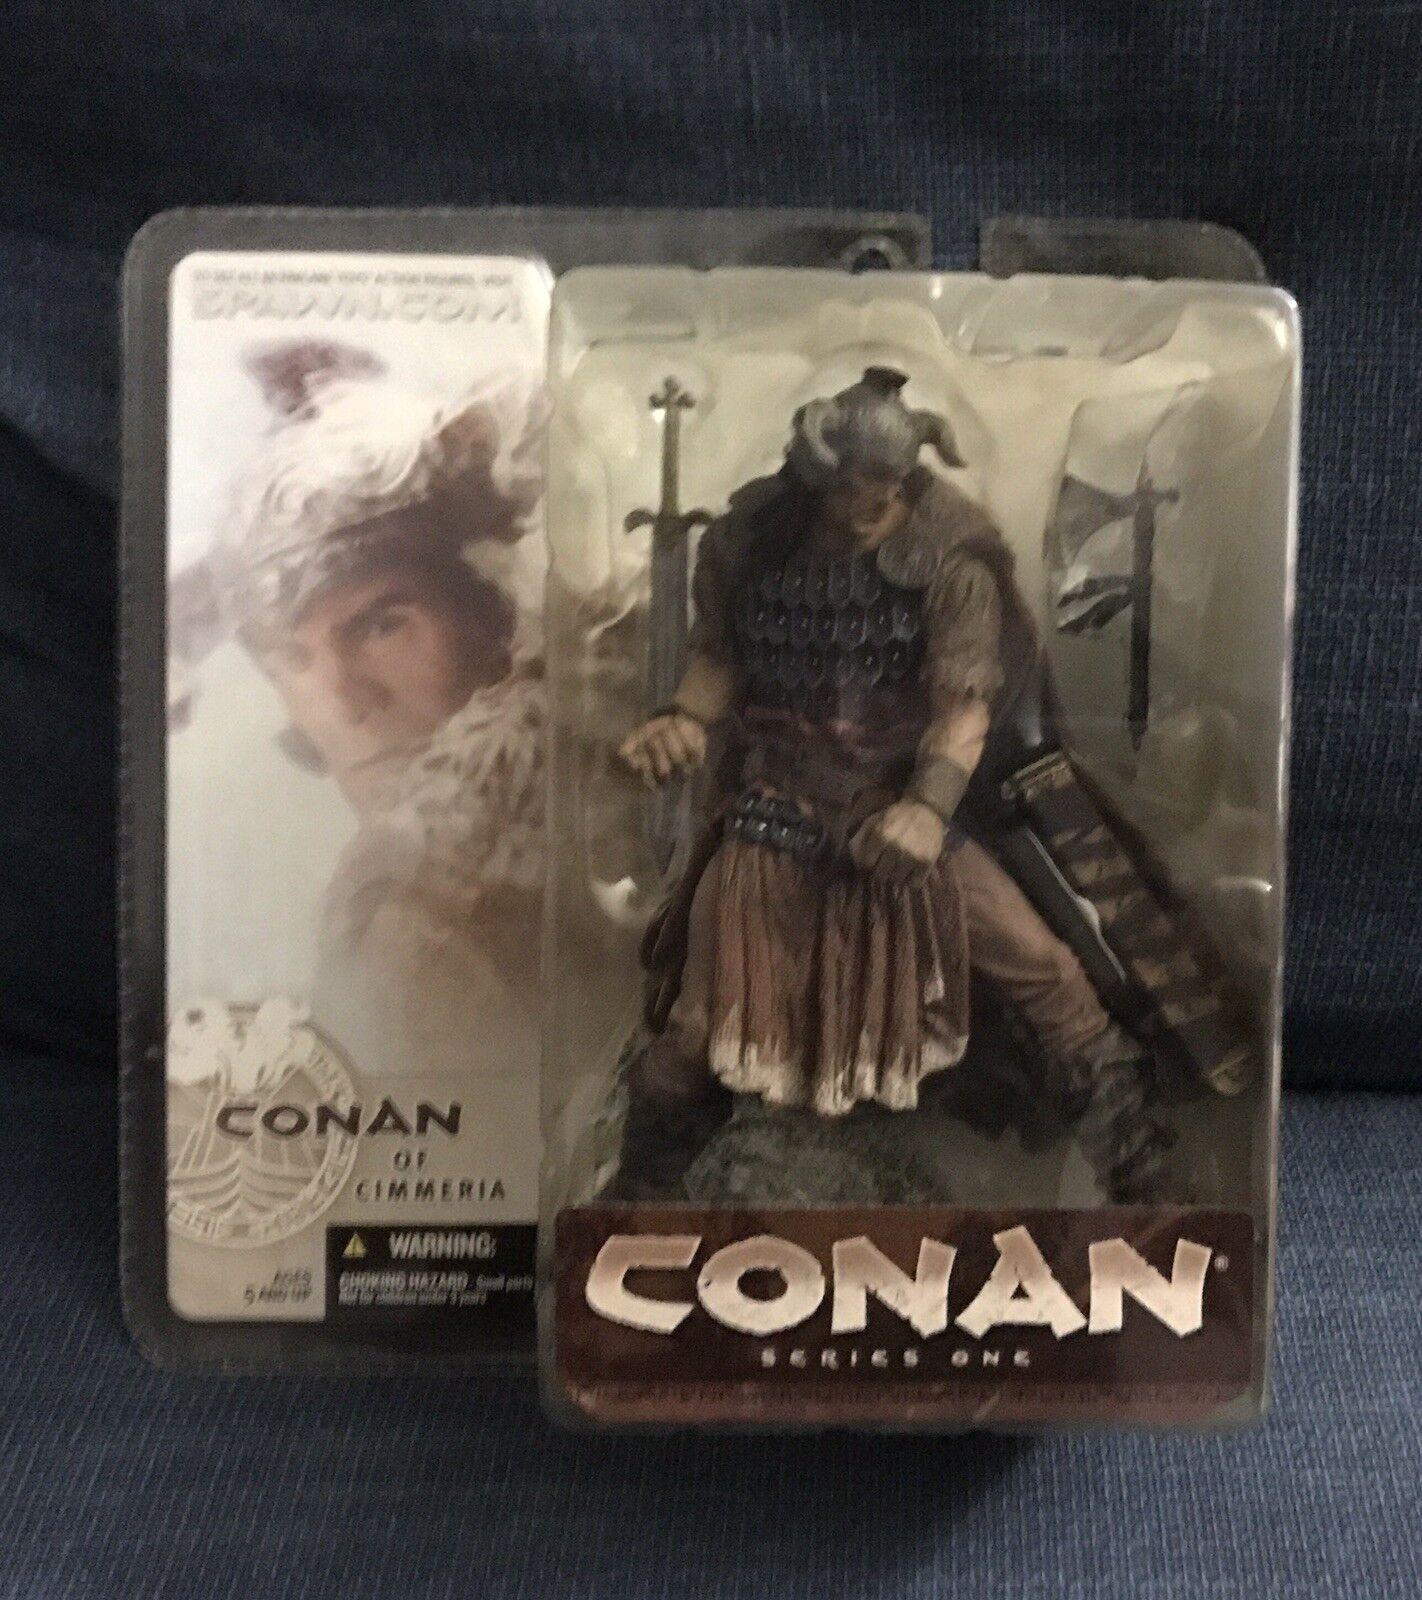 Conan The Cimmerian Action Figure 2004 McFarlane Toys Spawn Conan The Barbarian